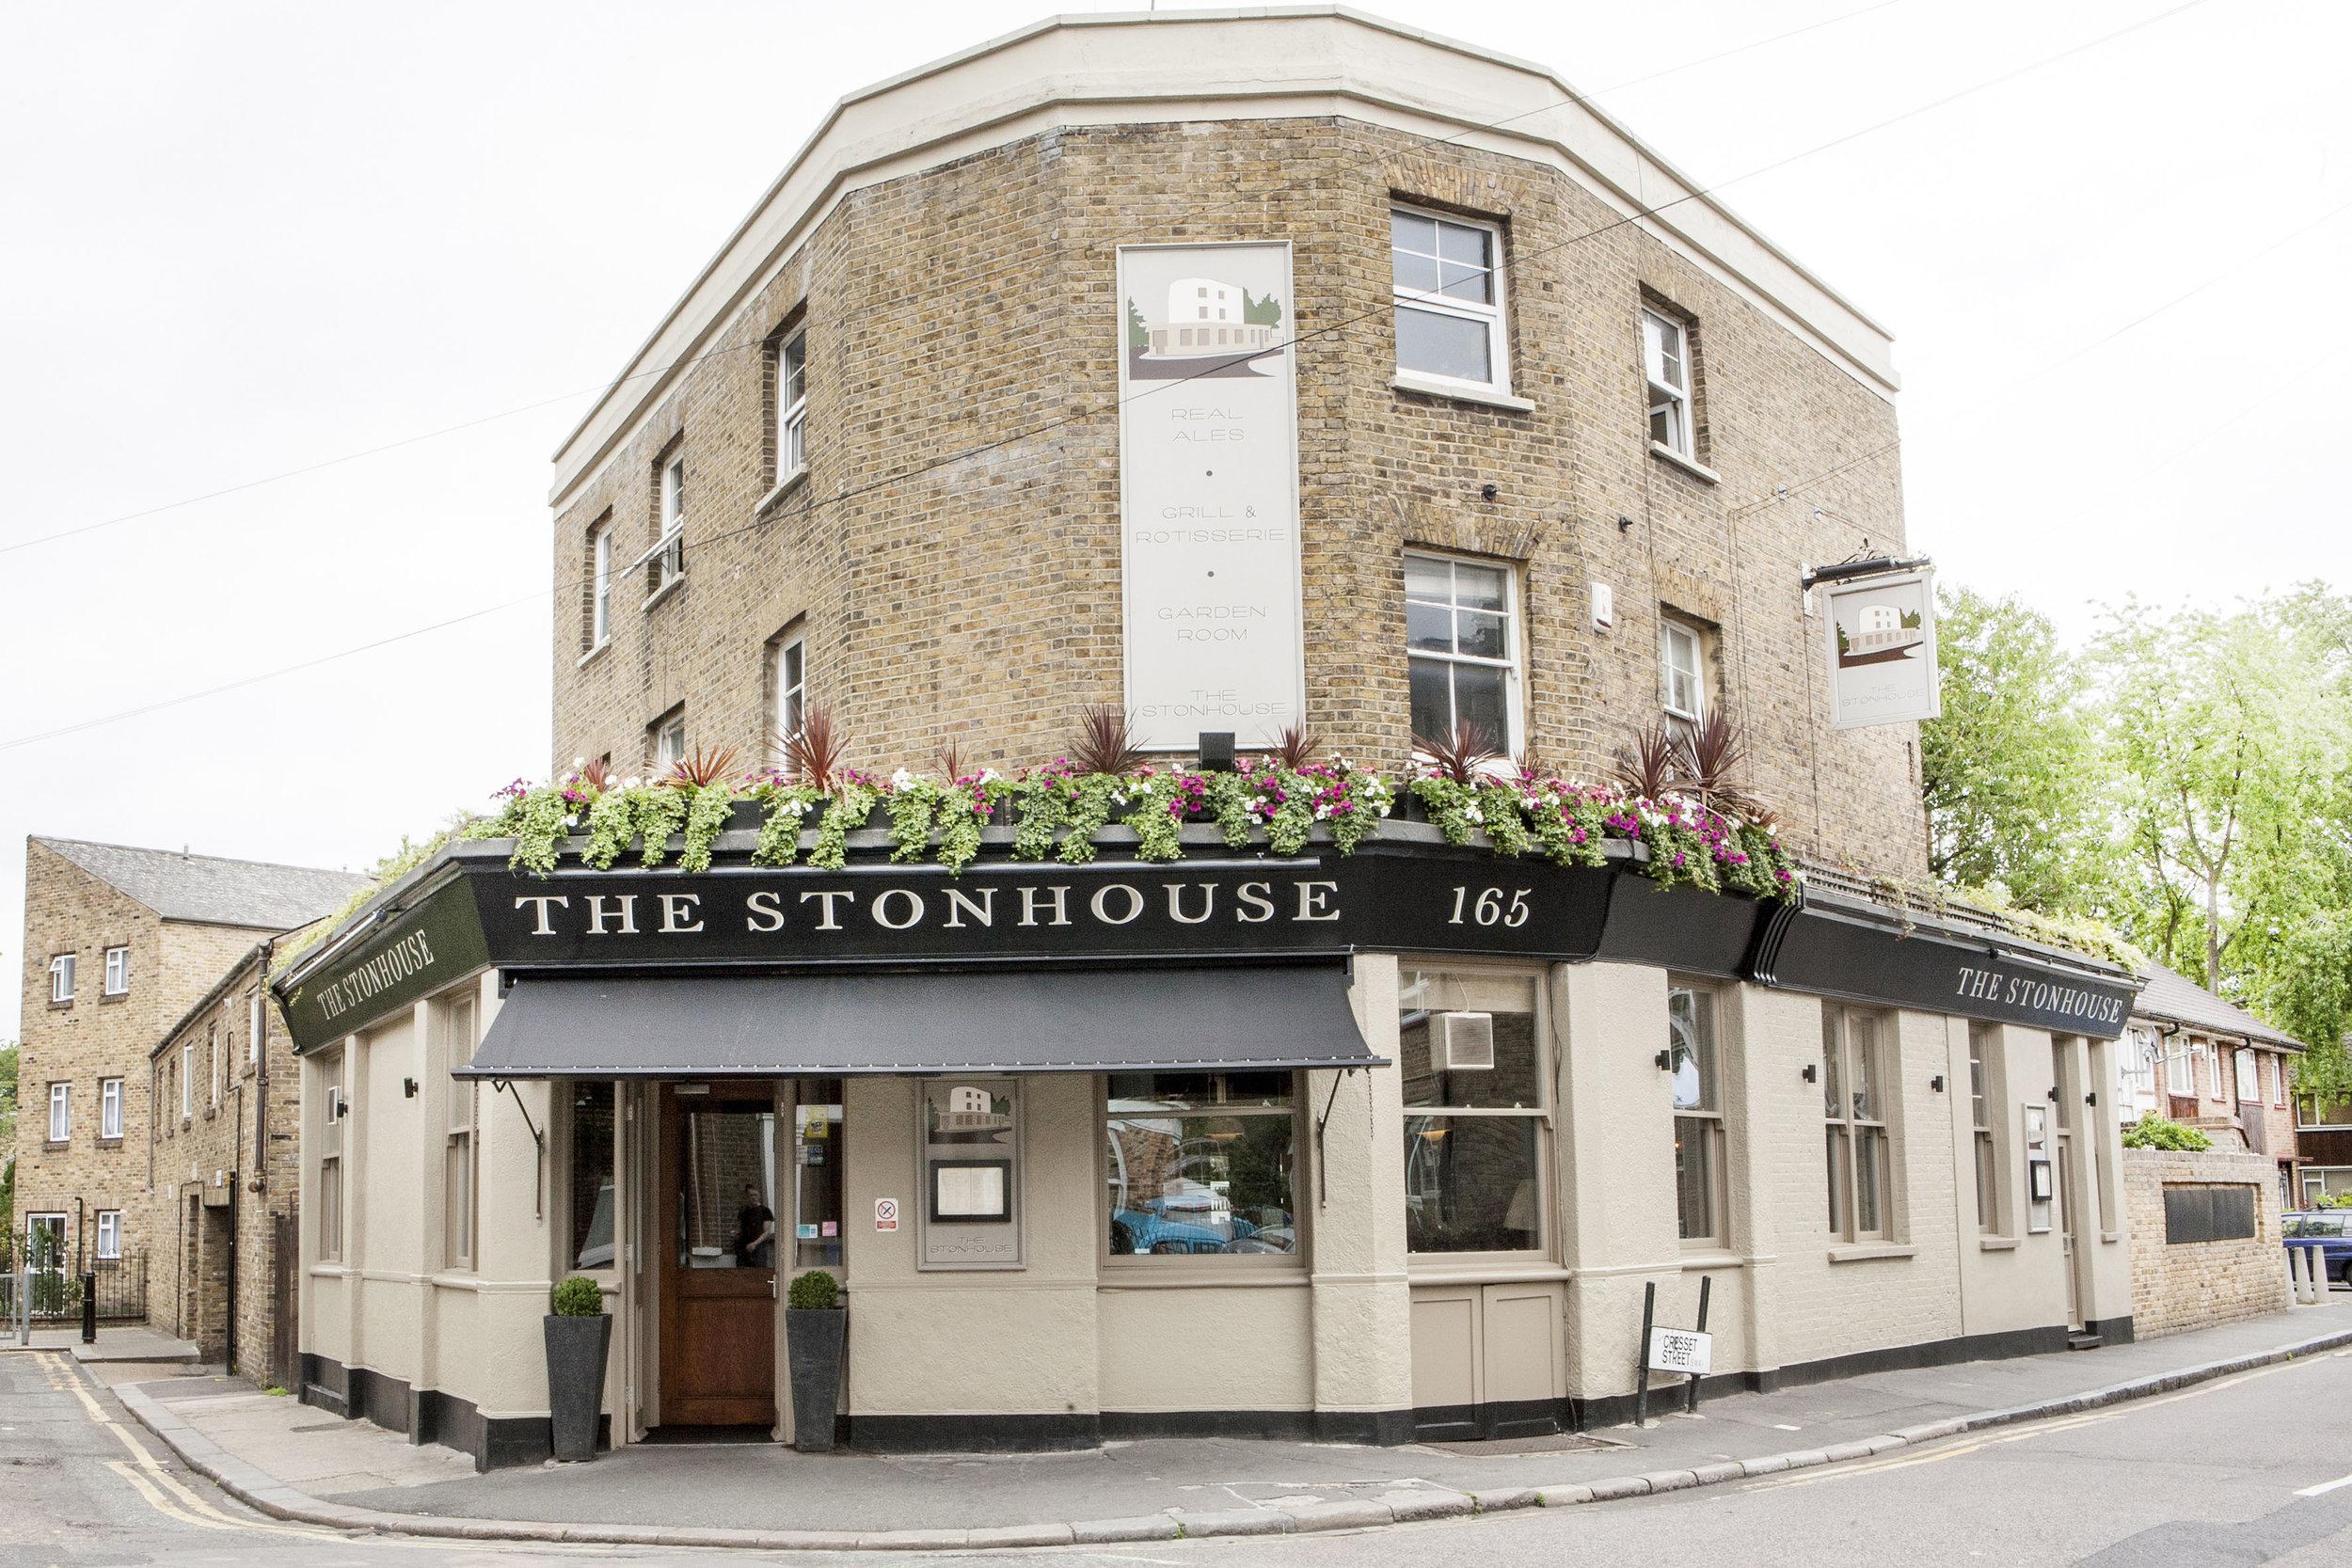 The-Stonhouse-1.jpeg